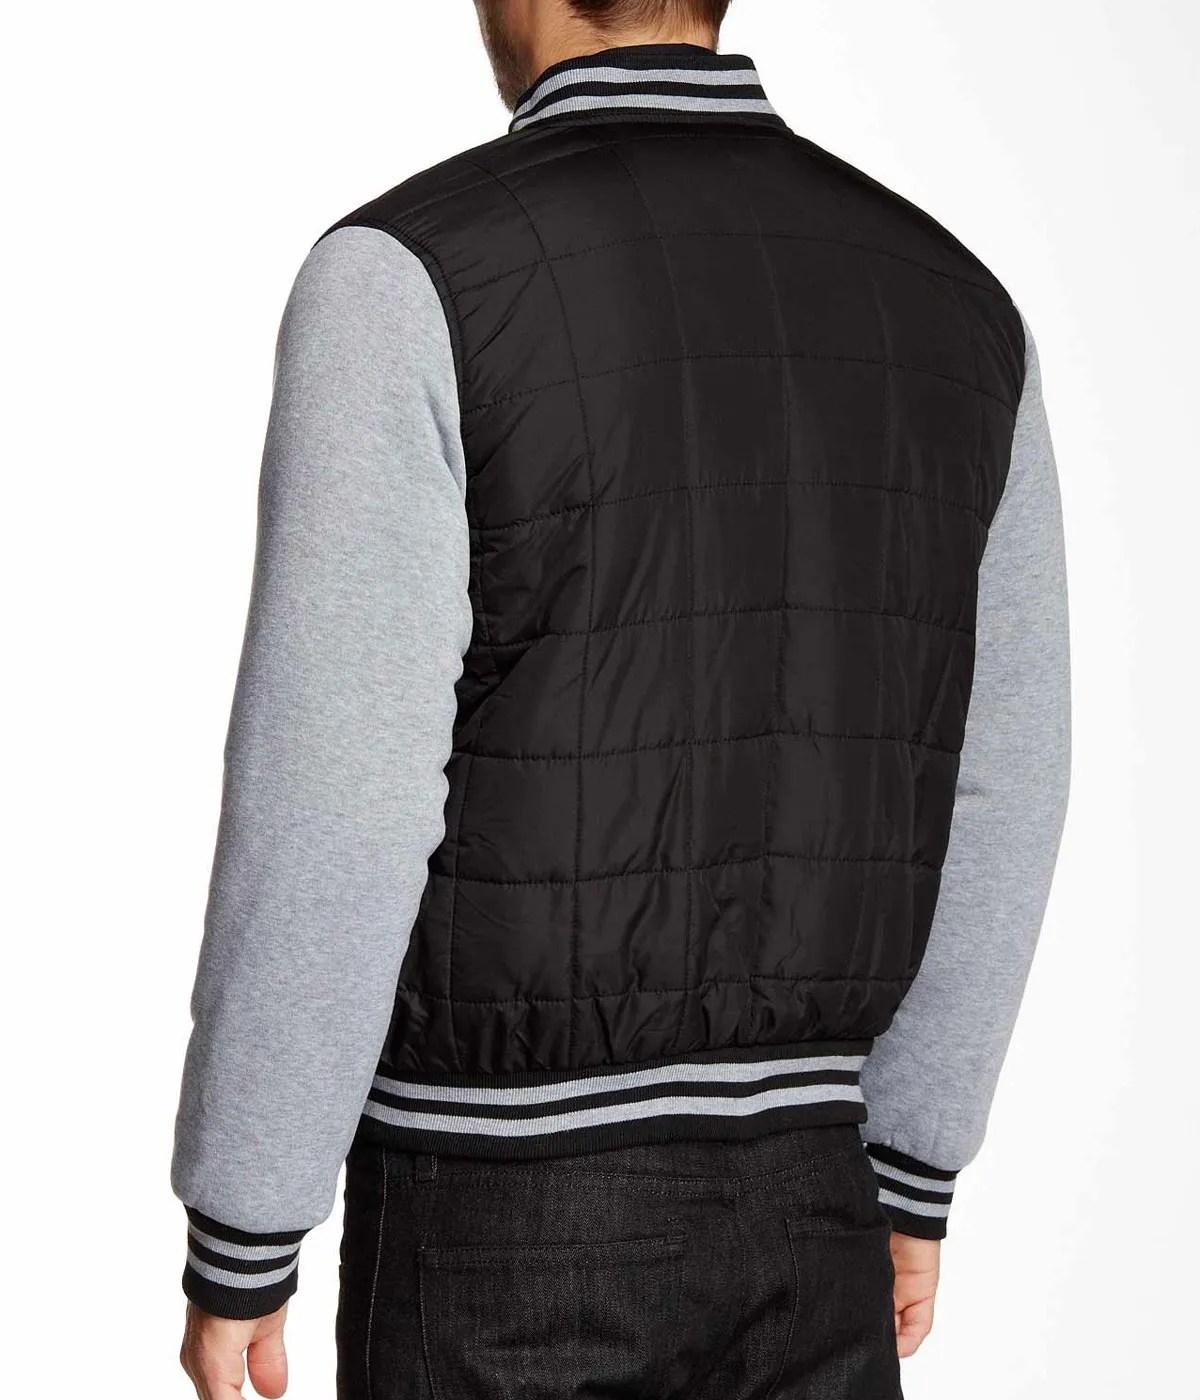 kingsman-the-secret-service-jacket